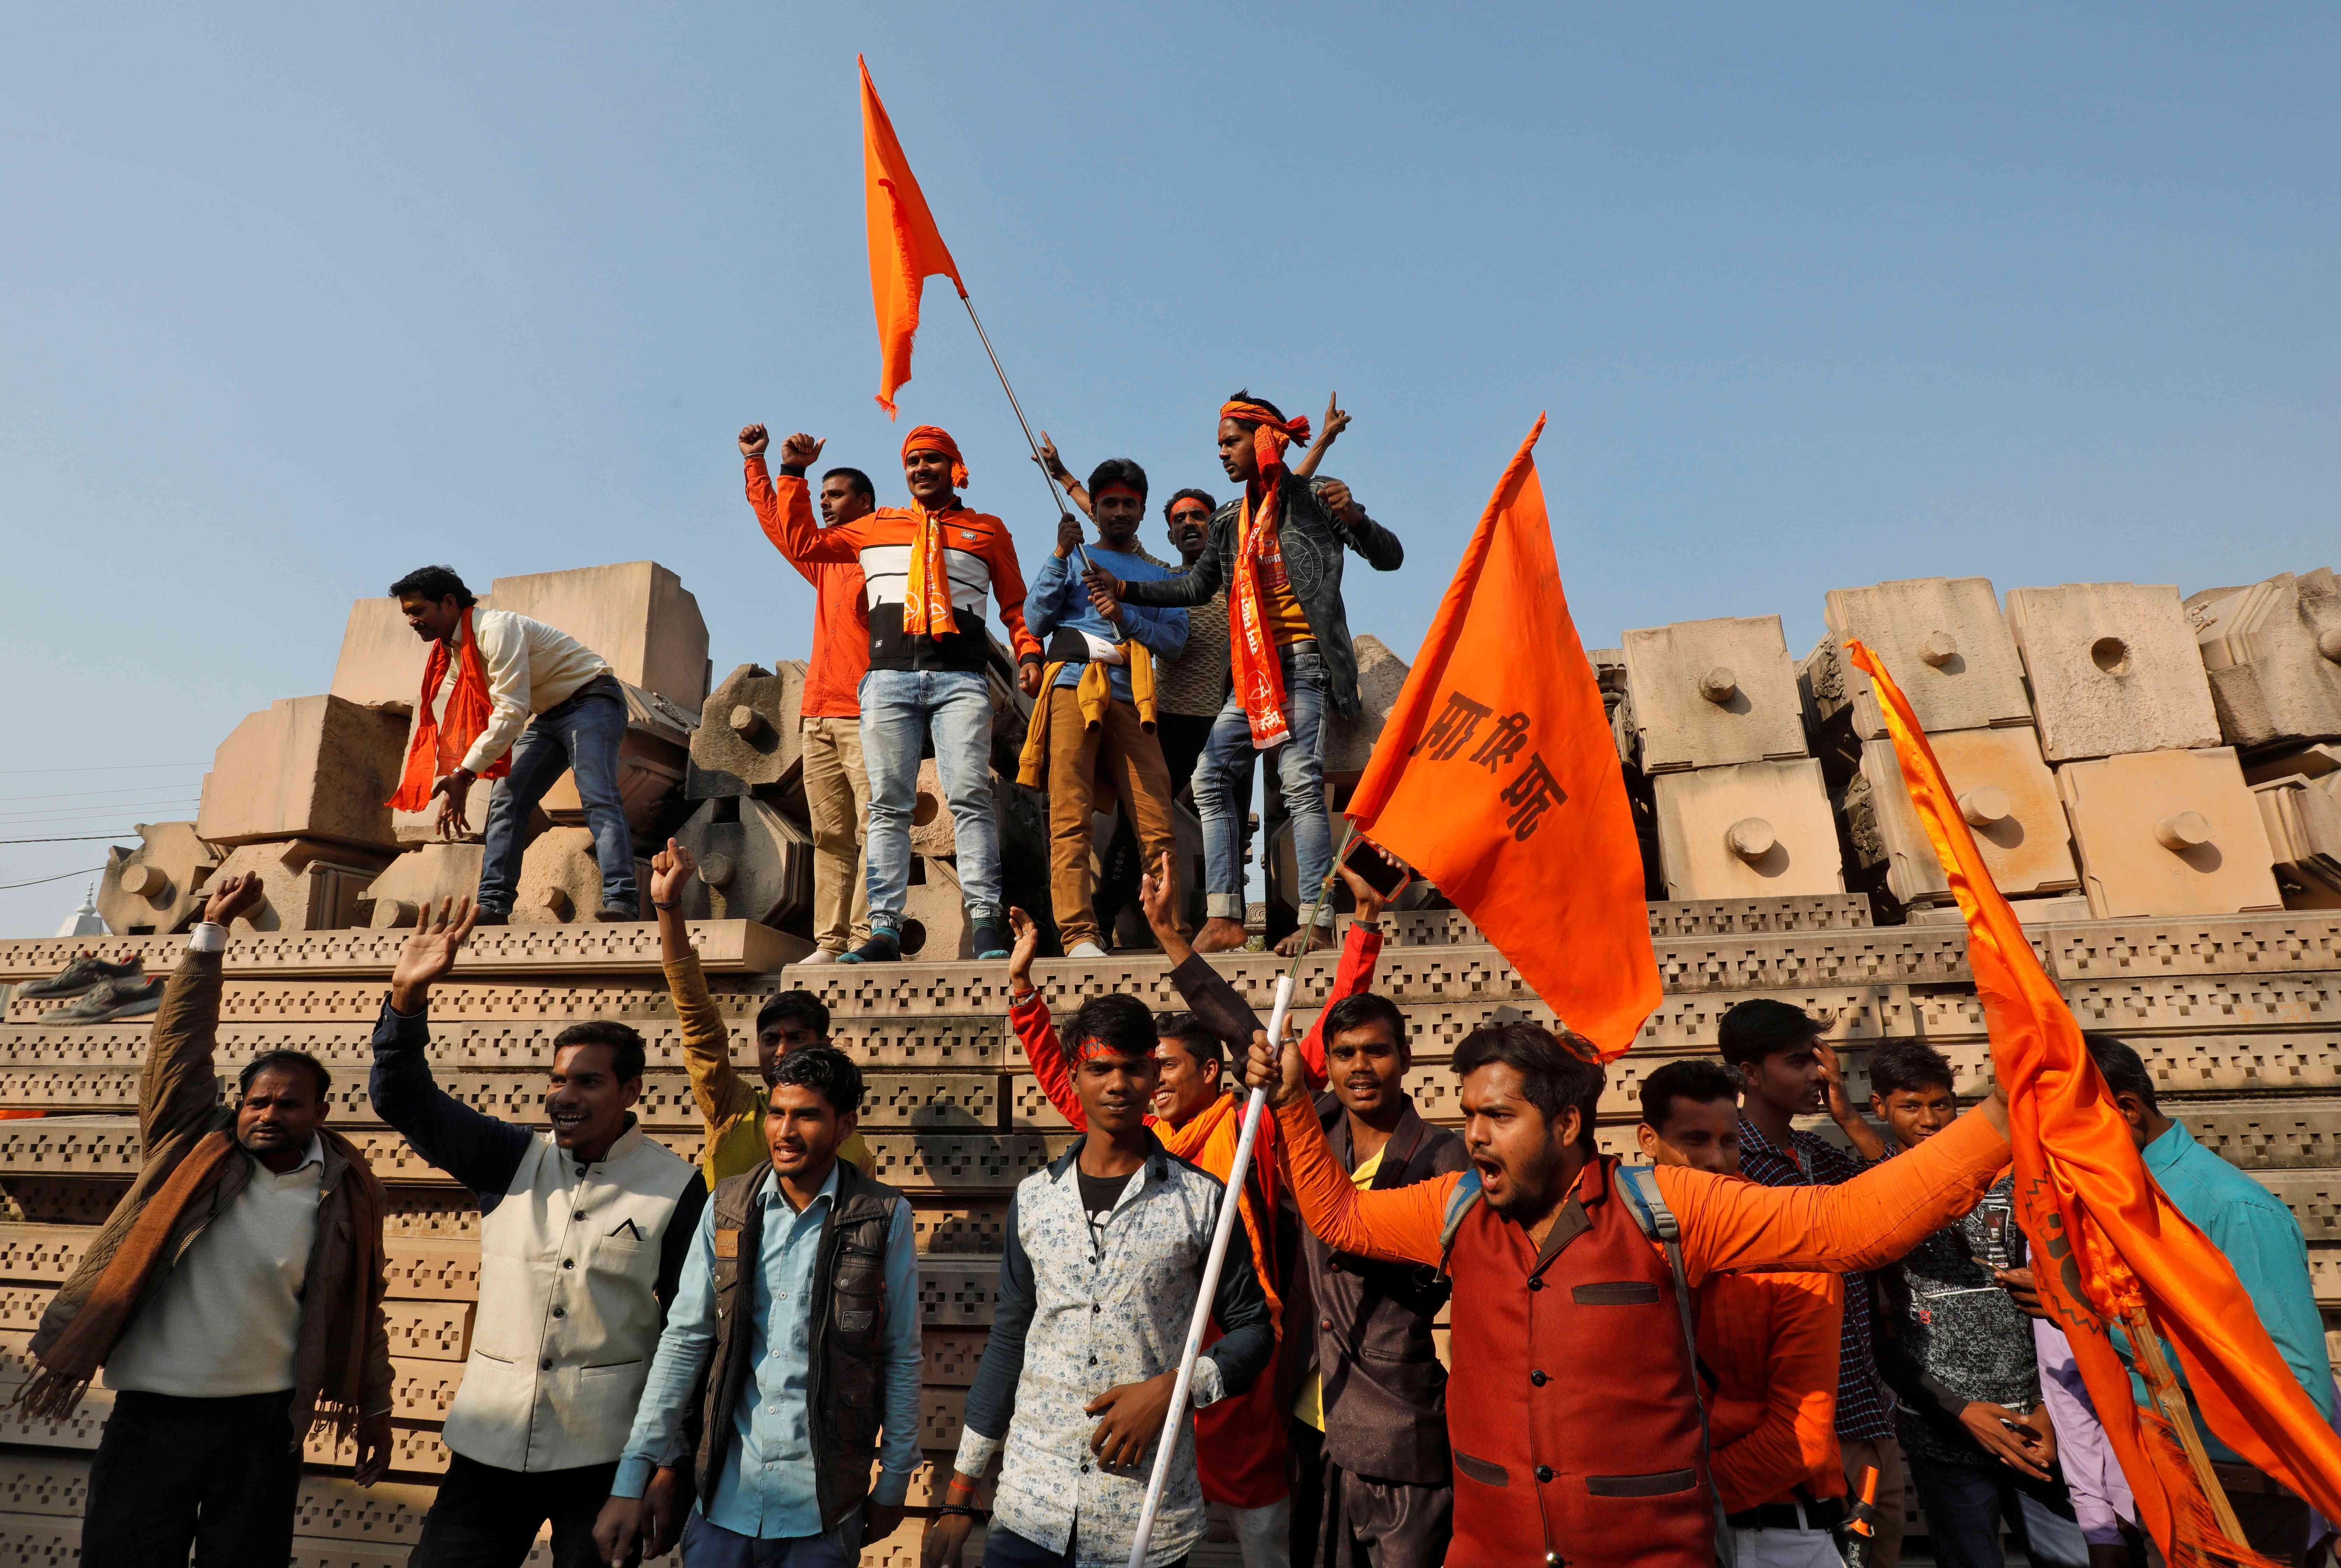 Vishwa Hindu Parishad supporters in Ayodhya in November. Credit: Pawan Kumar / Reuters